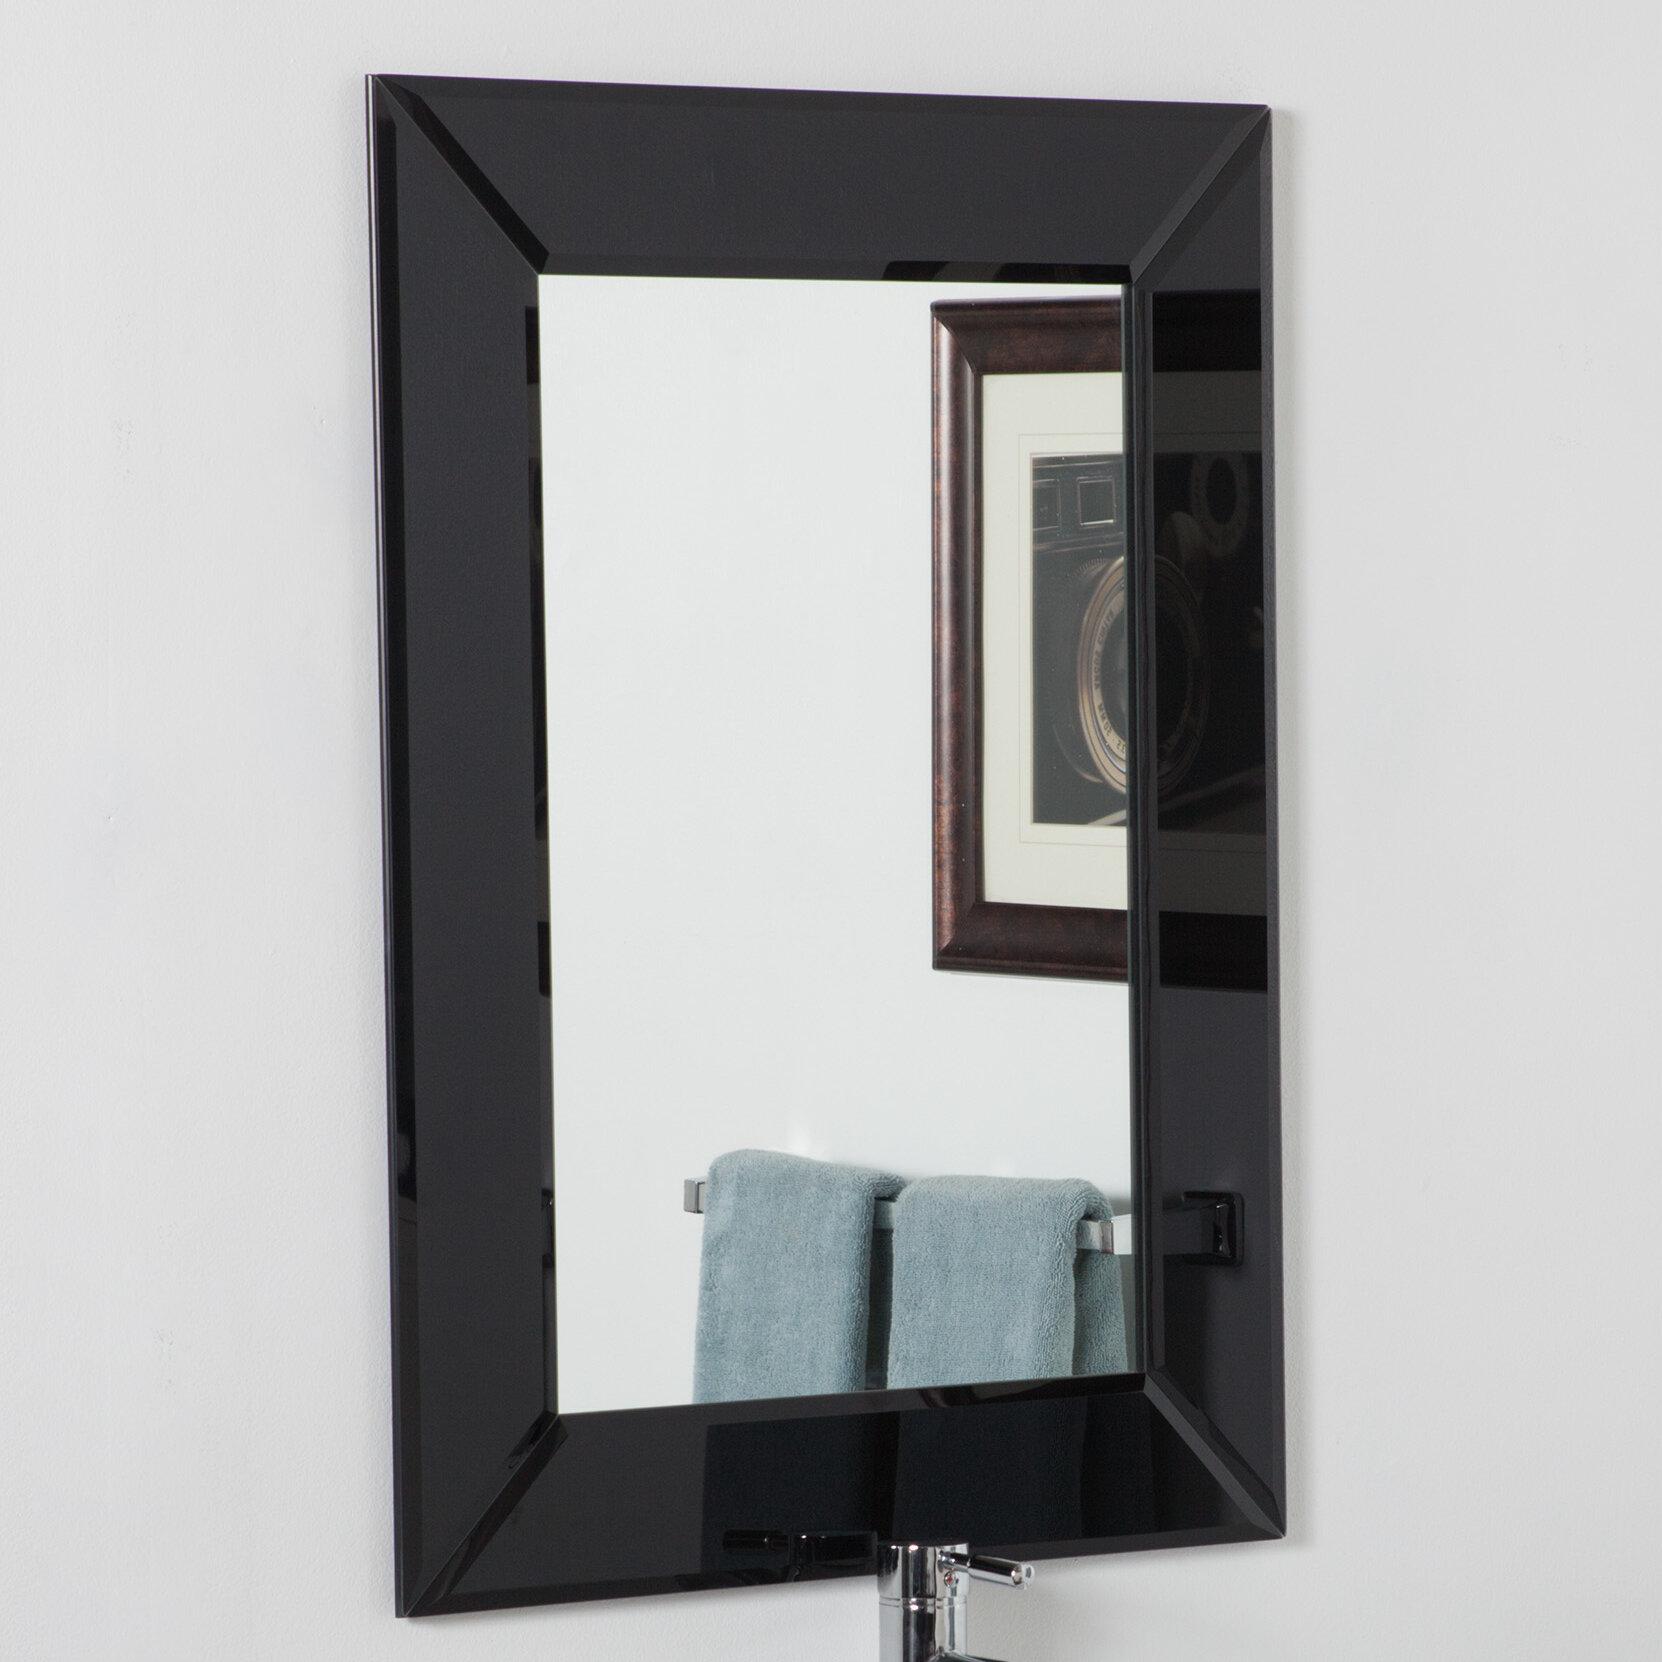 Decor Wonderland Infinity Wall Mirror & Reviews | Wayfair